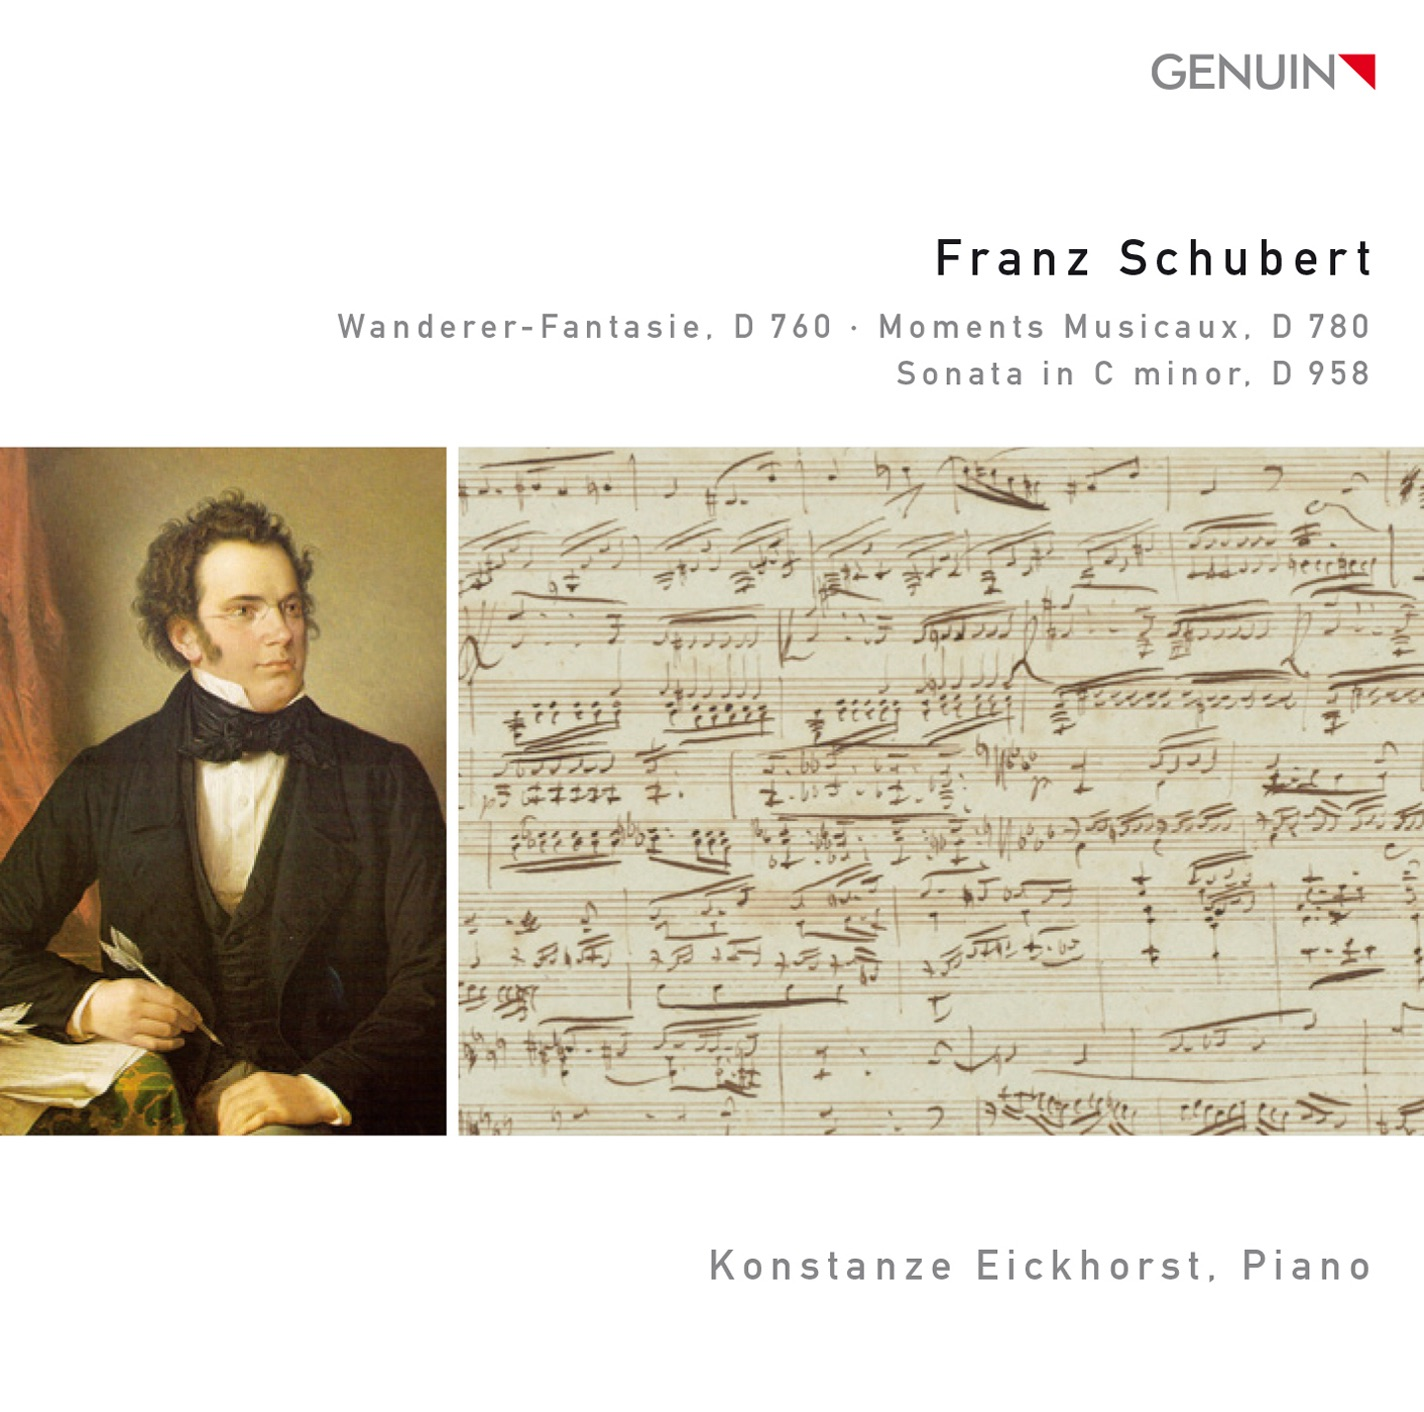 6 Moments musicaux, Op. 94, D. 780: No. 5 in F Minor. Allegro vivace